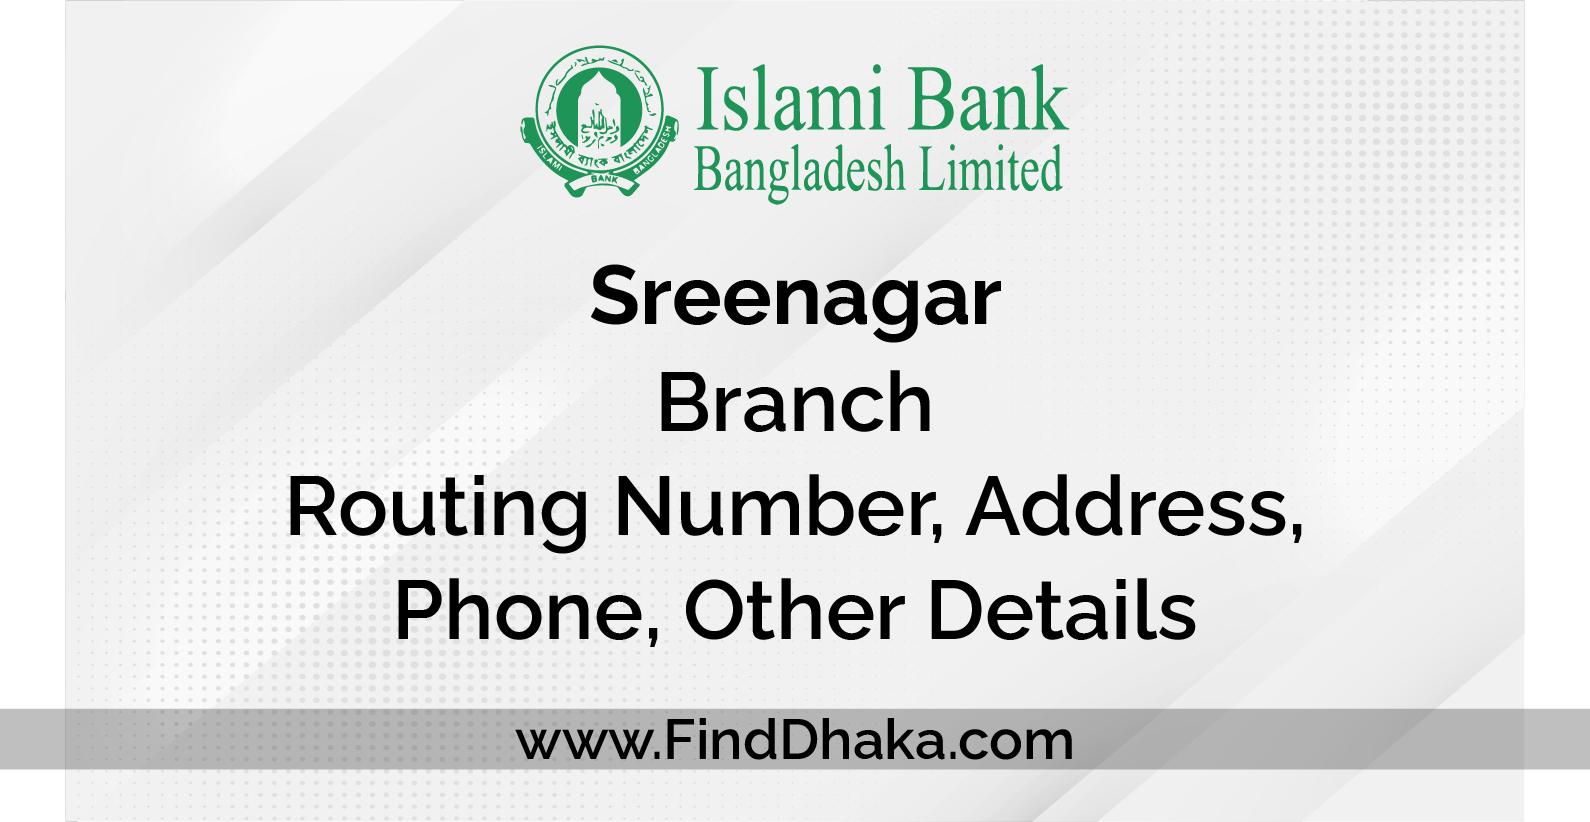 Photo of Islami Bank Sreenagar Branch